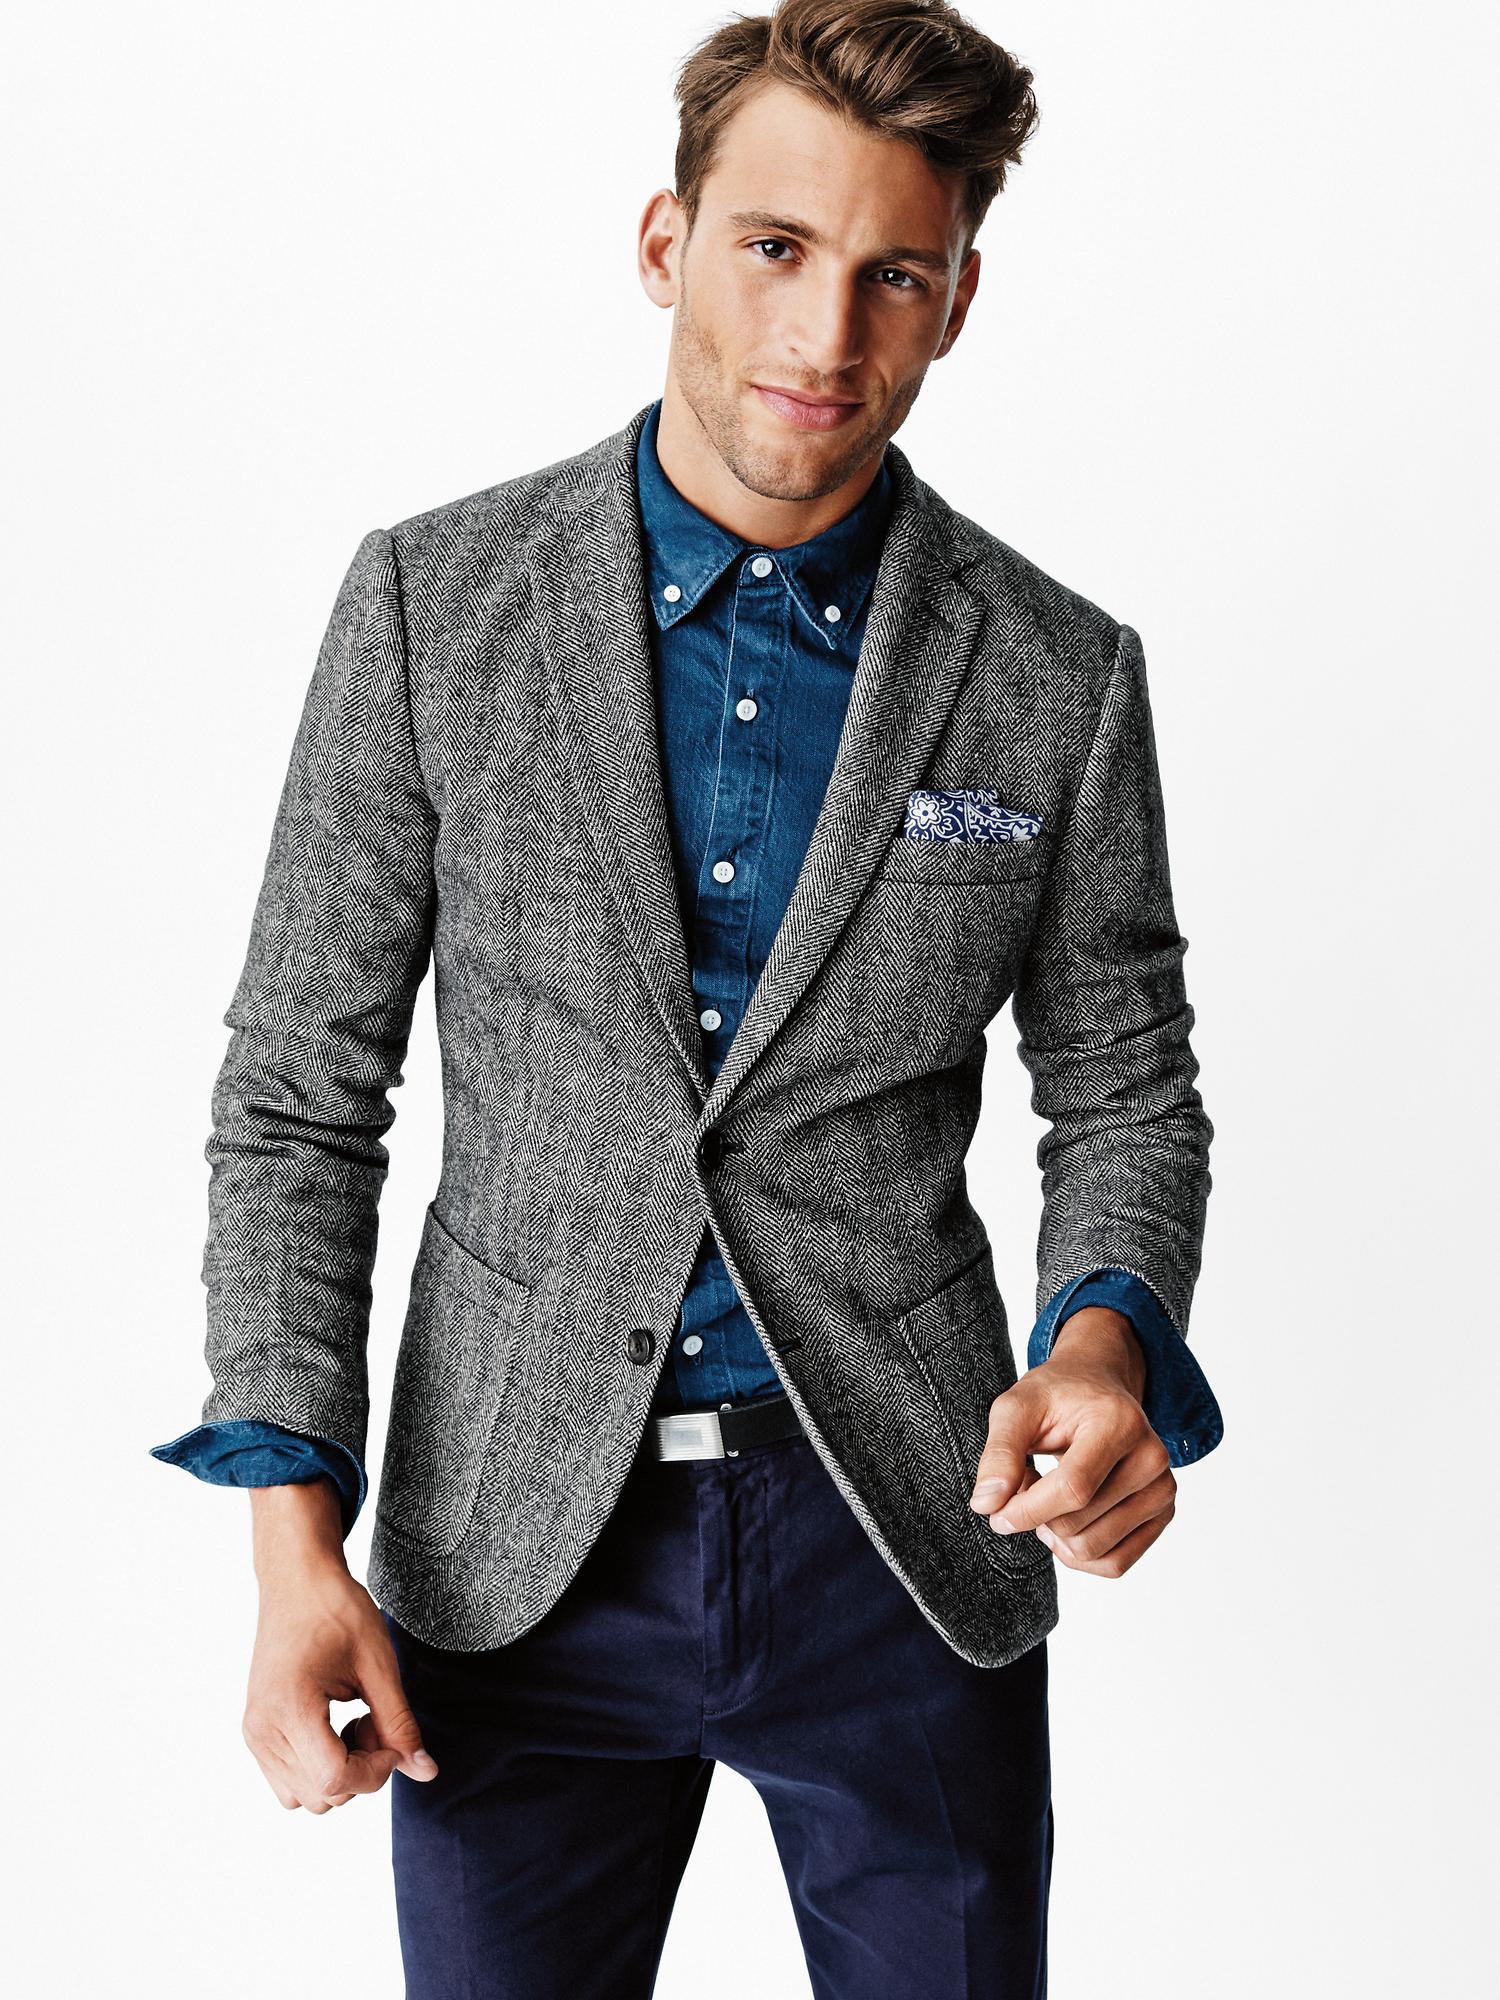 gap--gq-brooklyn-tailors-herringbone-blazer-product-1-24244088-5-907186747-normal.jpg